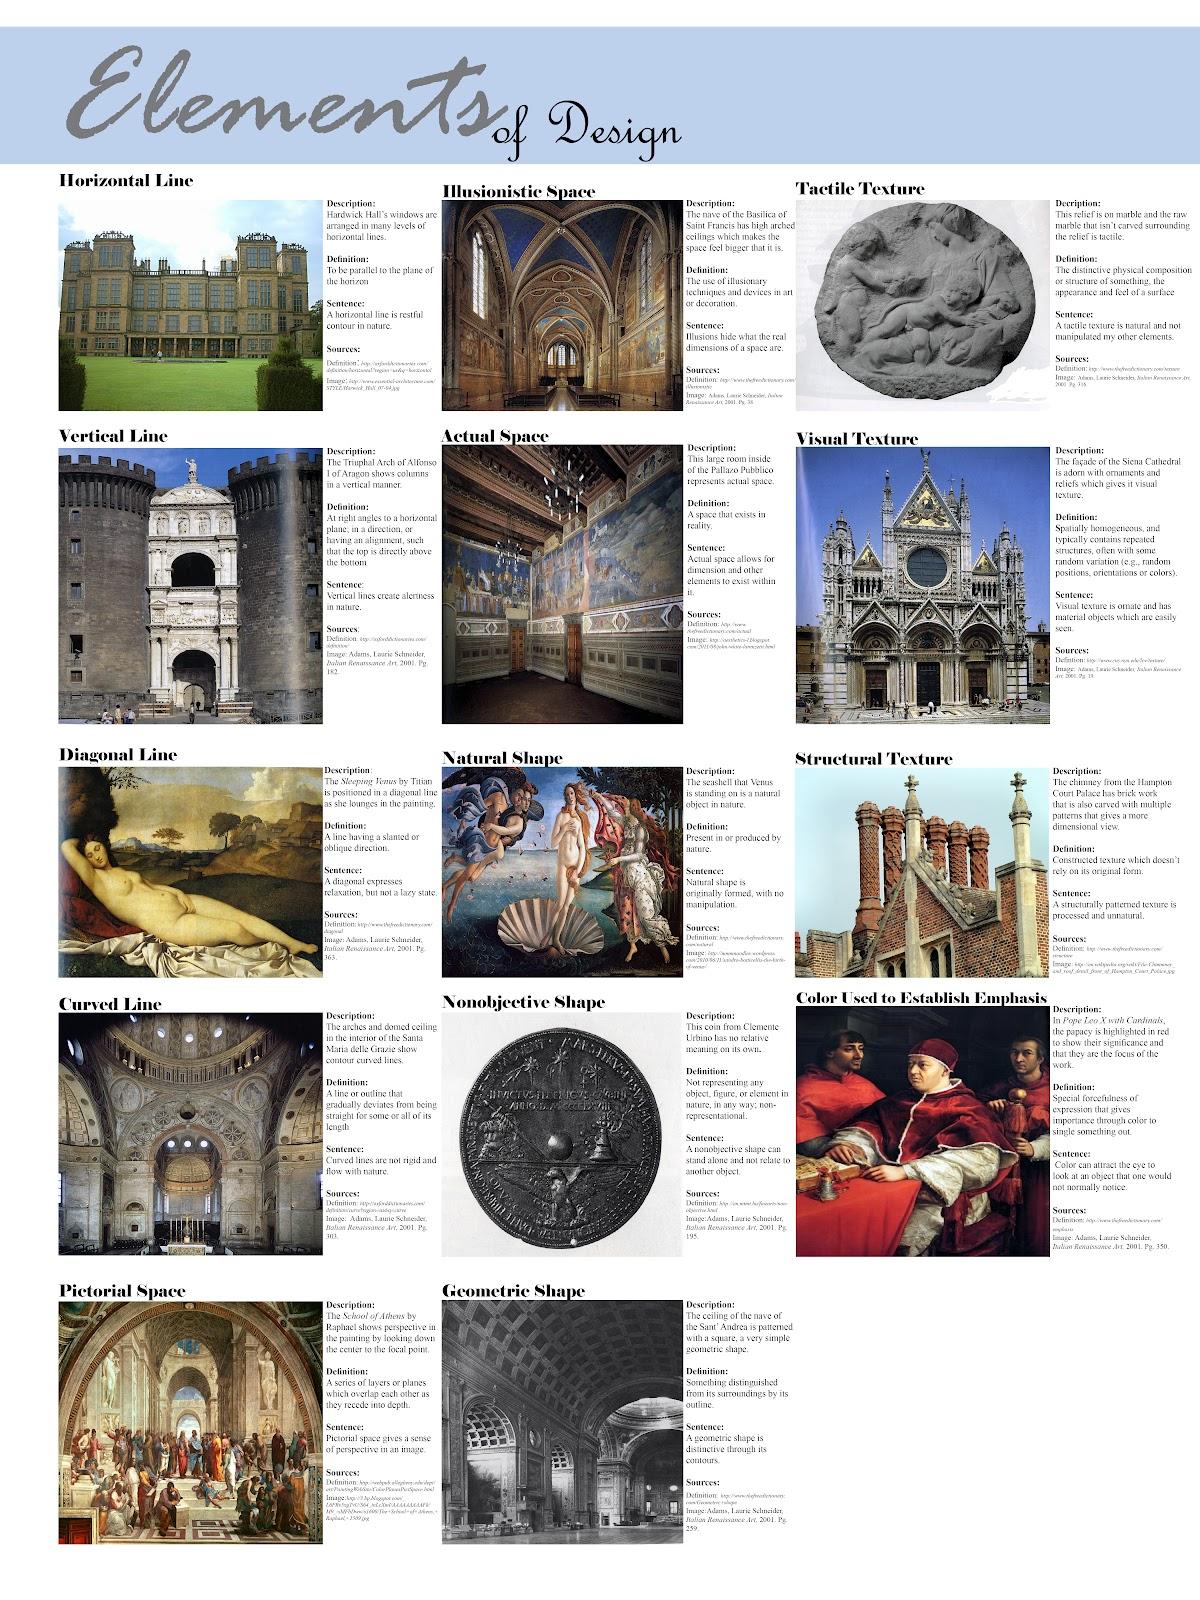 Interior Design Principles and Elements